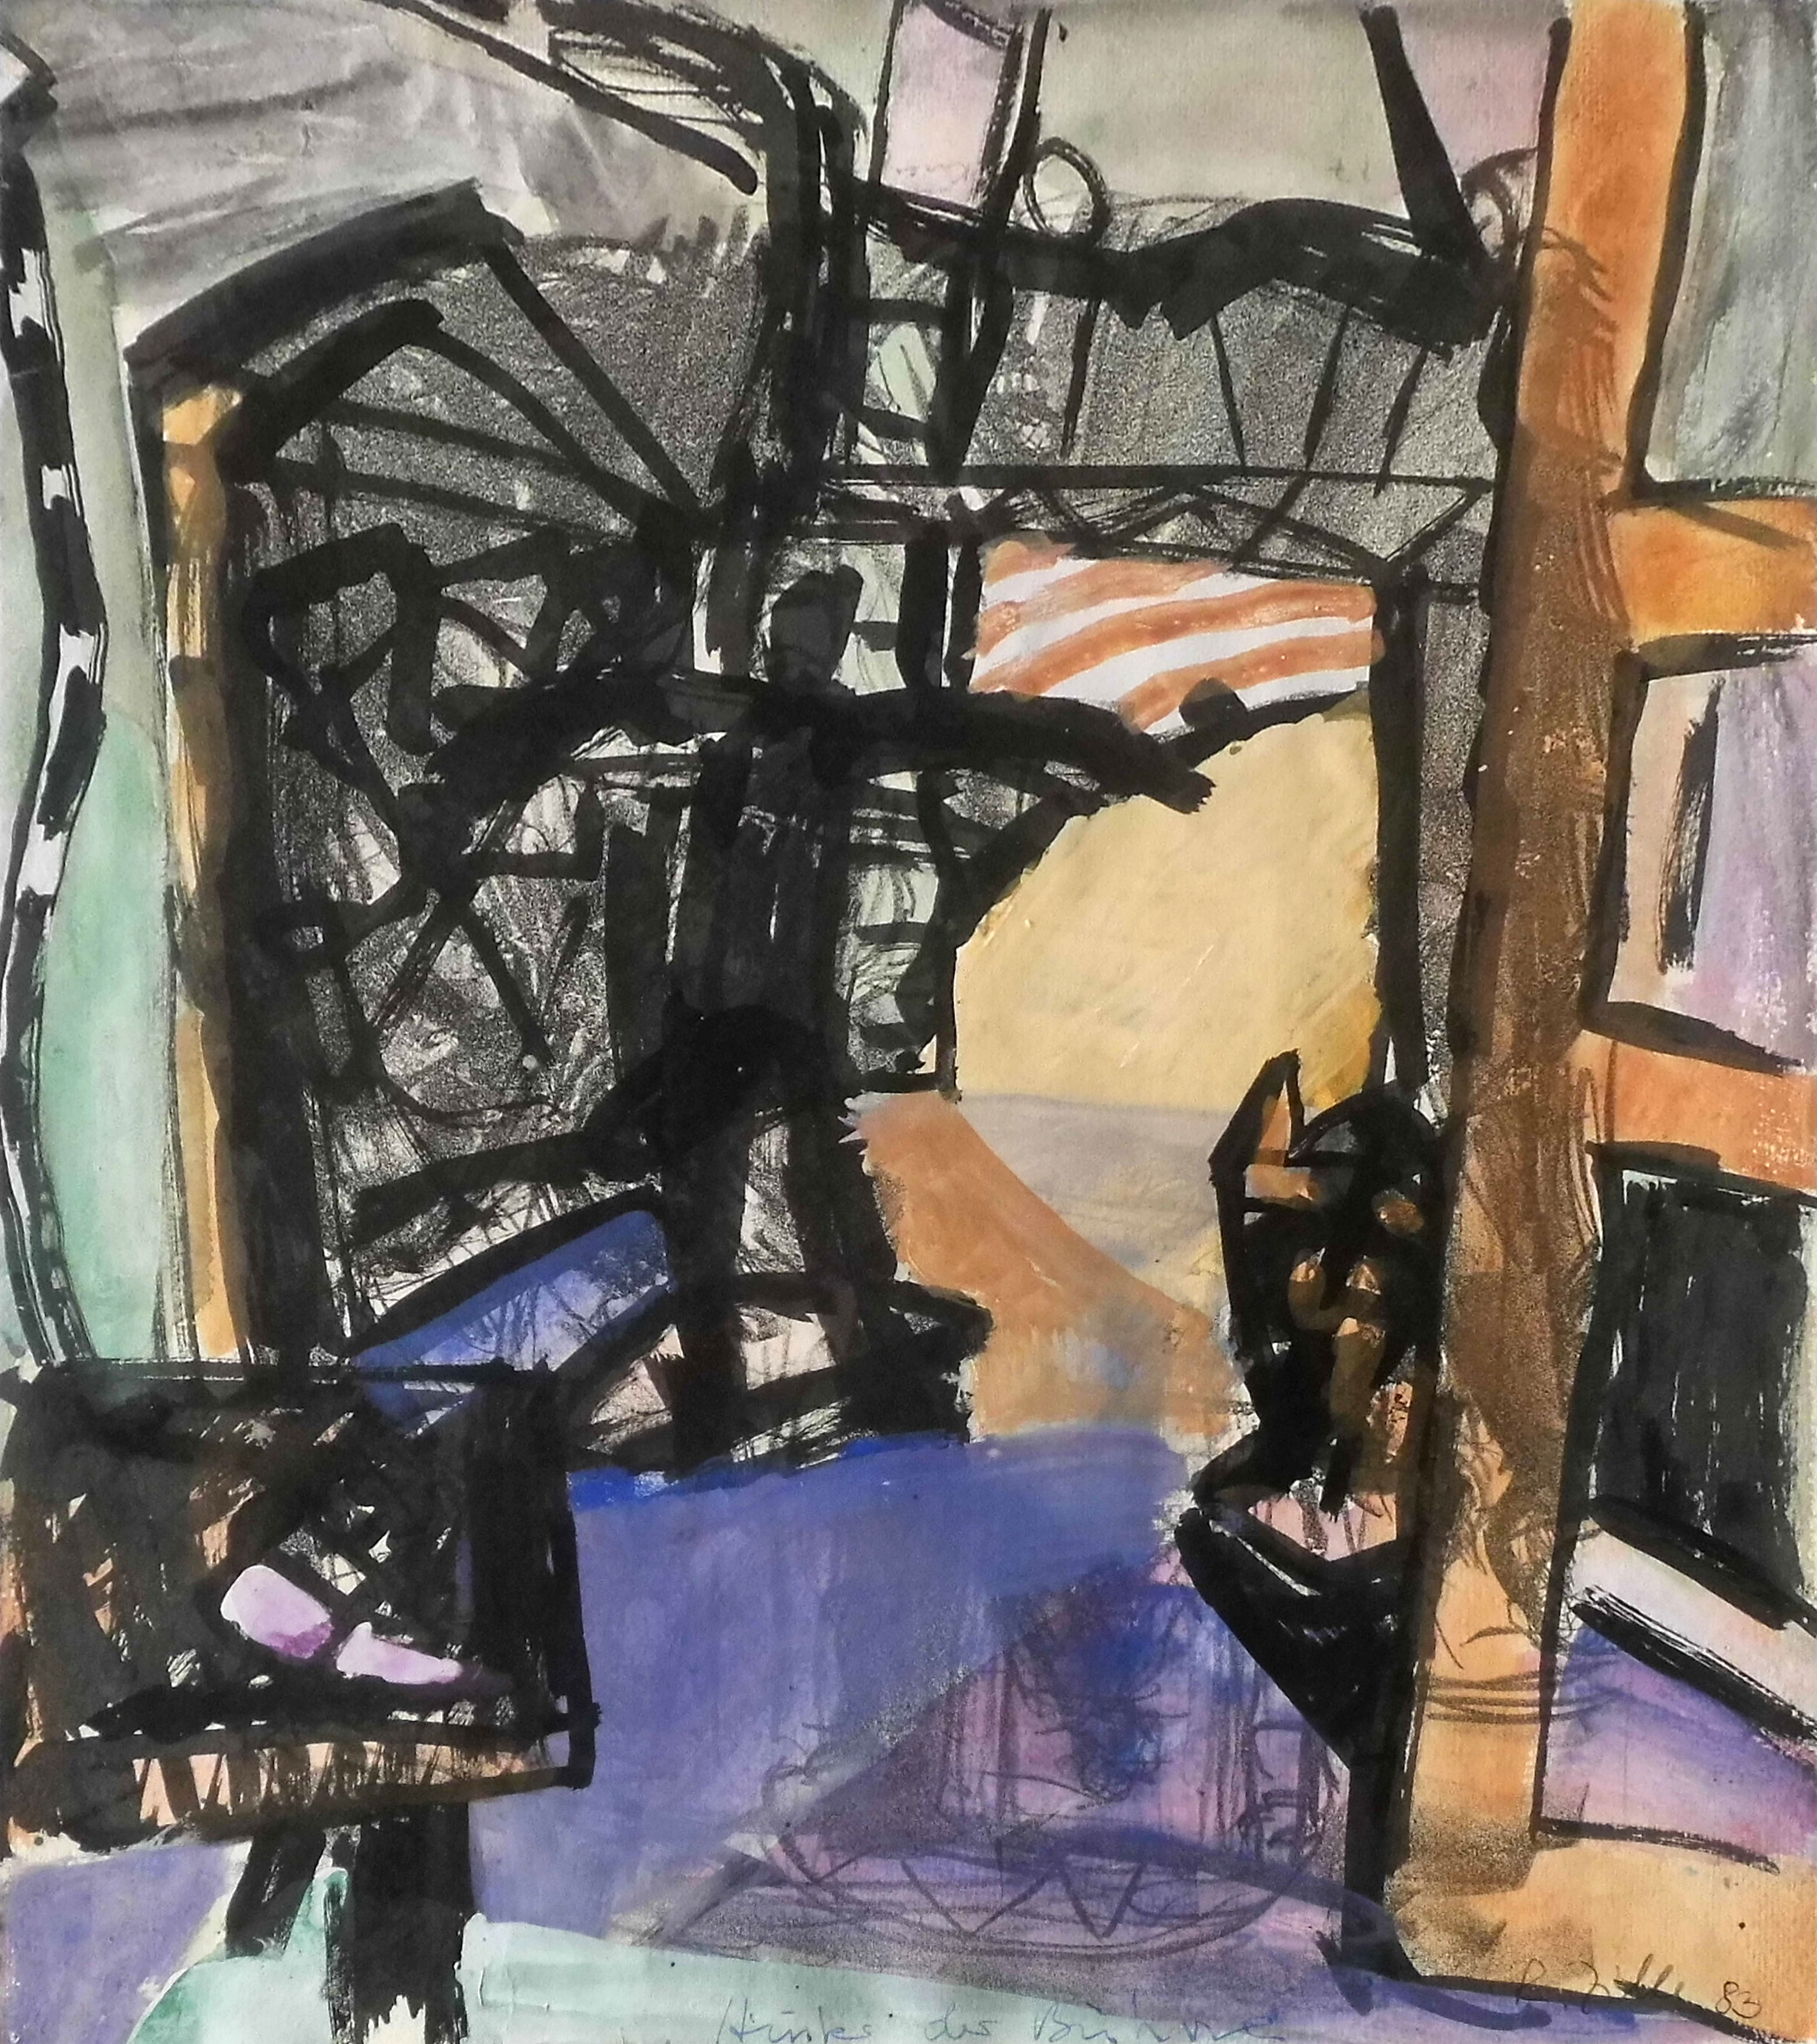 01-rainer_zille-hinter_der_buehne-1983-aquarell-46x38